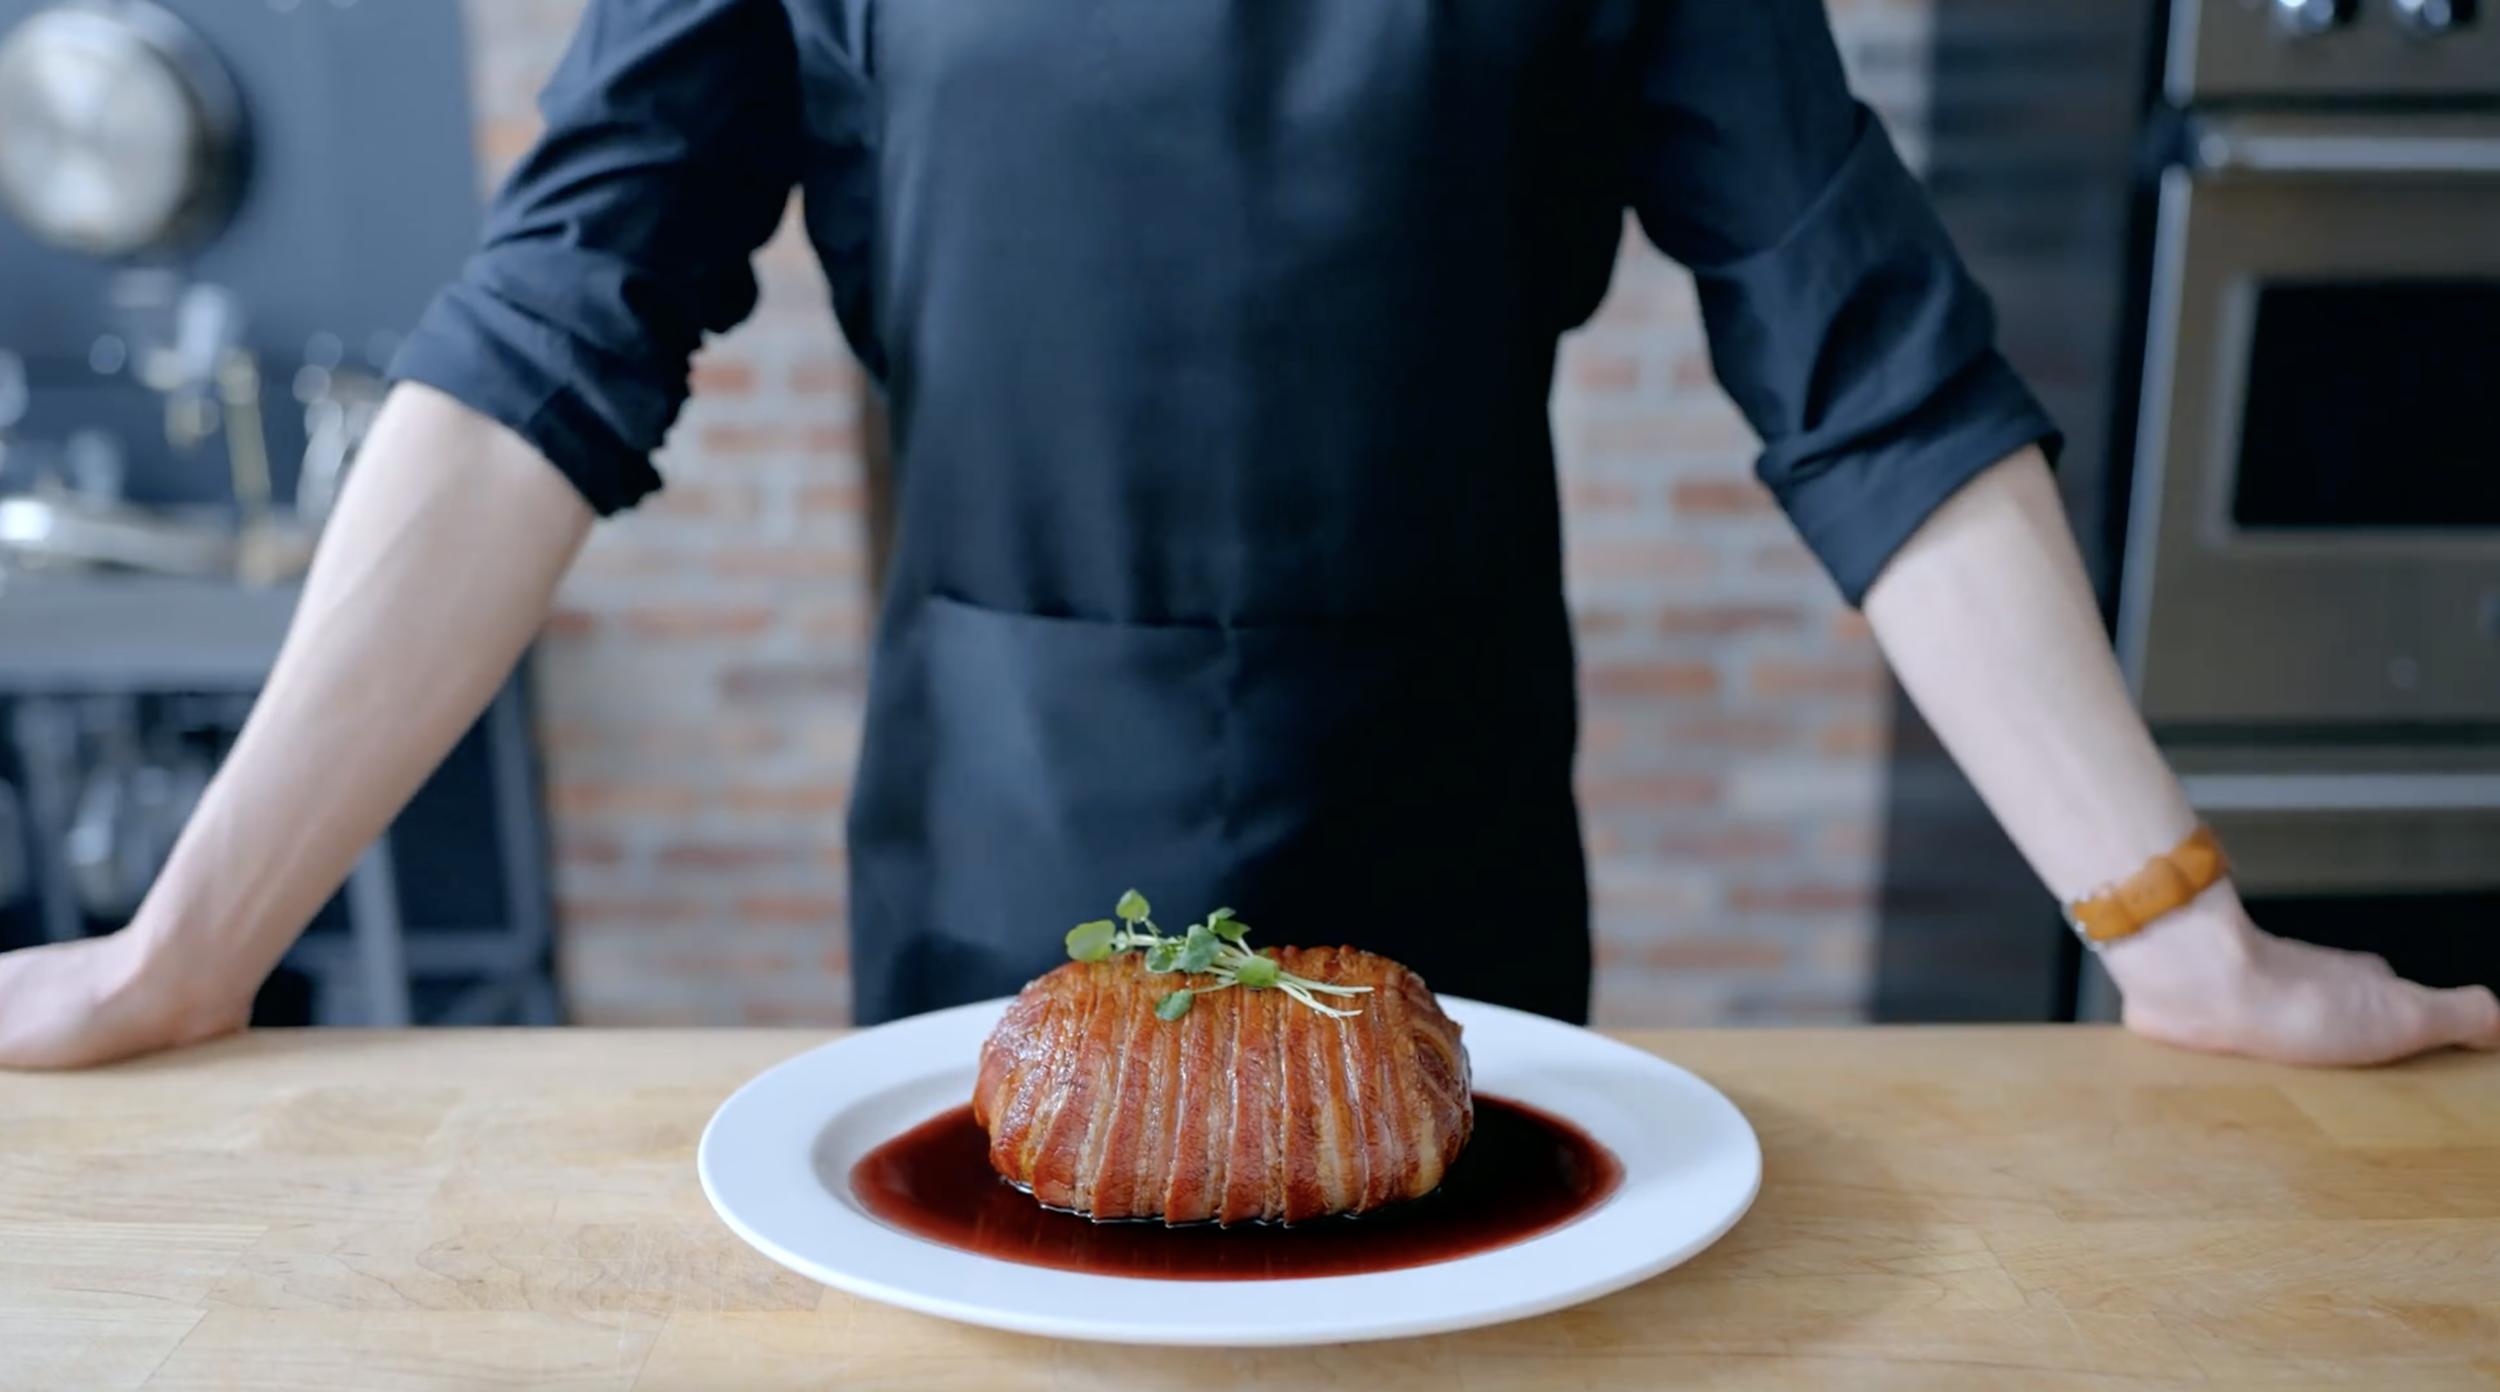 Gotcha Pork Roast Inspired By Food Wars Shokugeki No Soma Binging With Babish